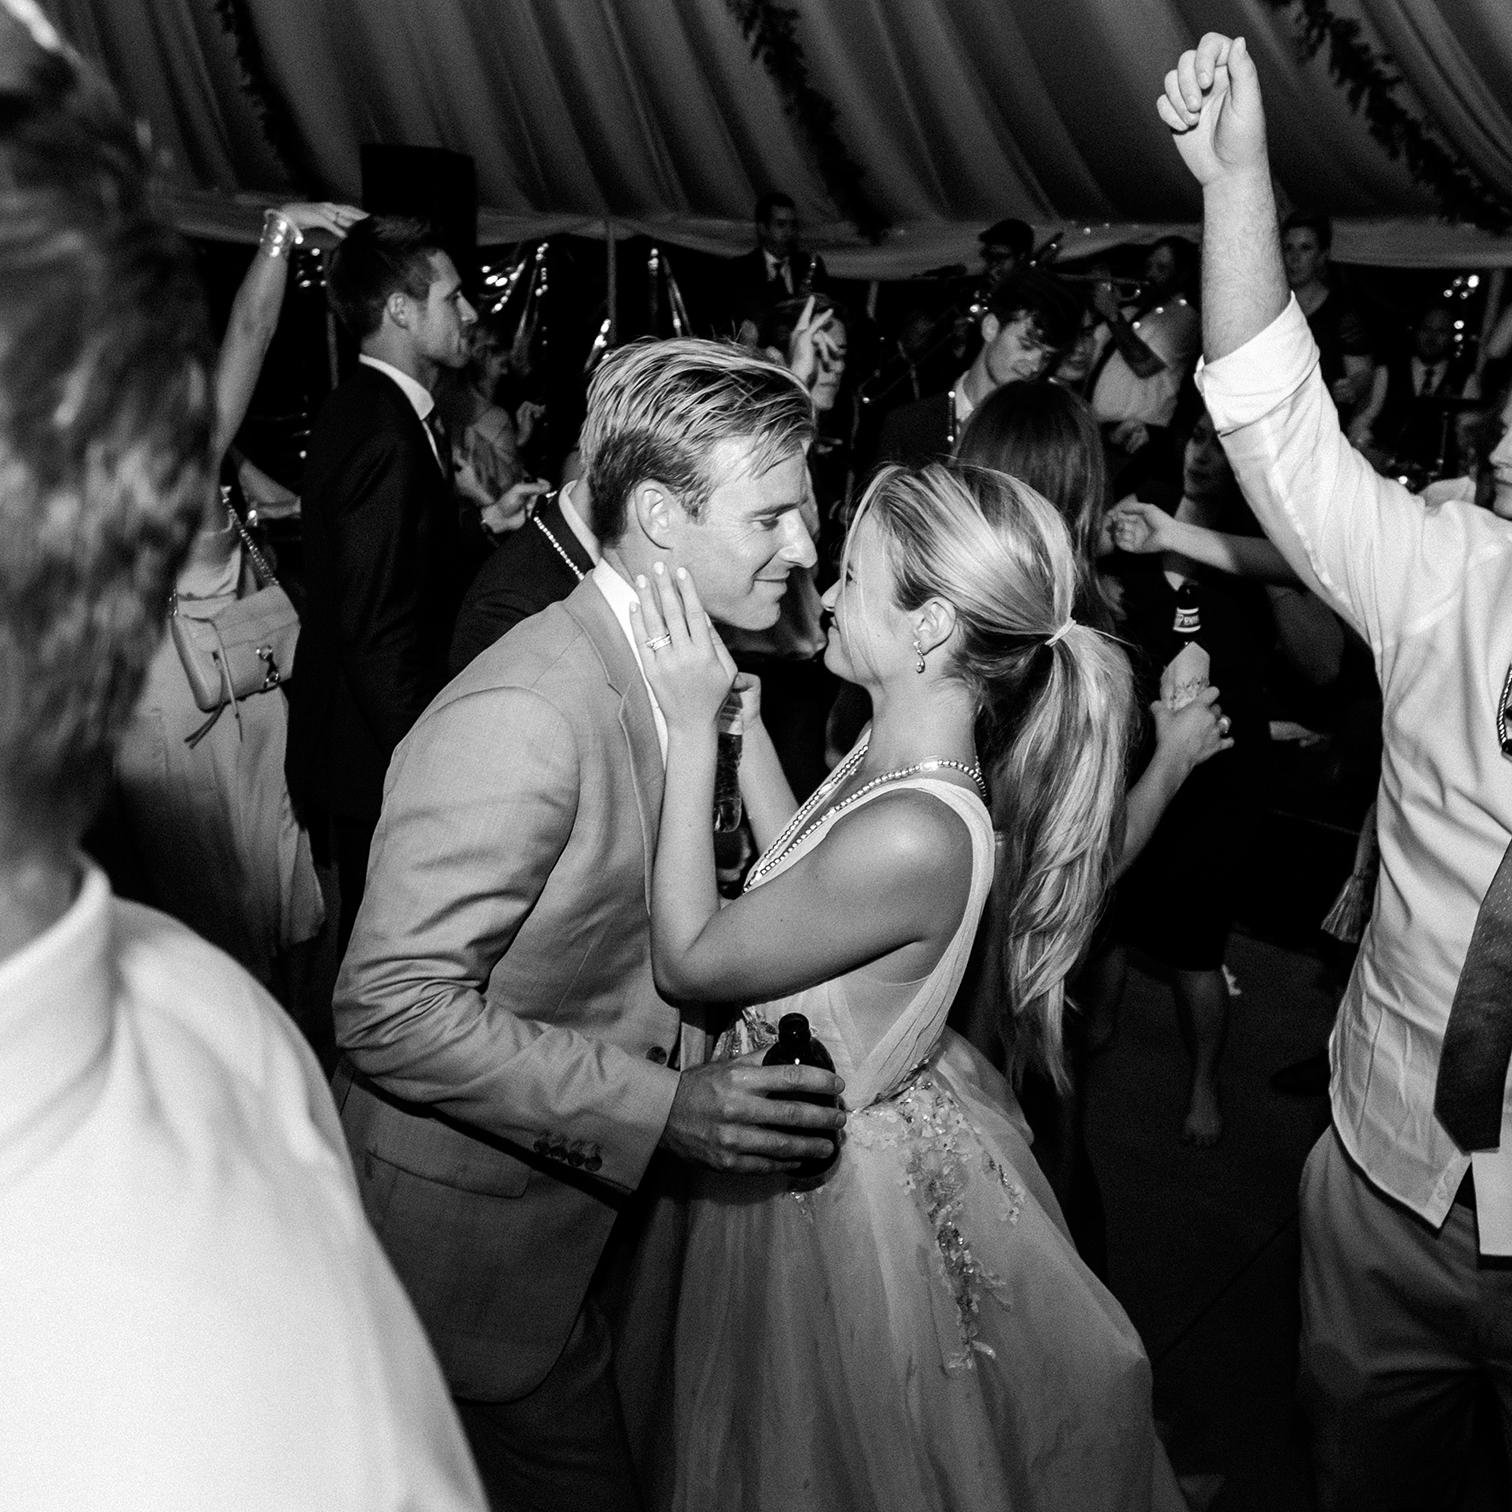 Wedding Photographers Colorado, Tented Wedding Receptions, Bride and Groom Dancing, Candid Wedding Photography, Best Colorado Photographers